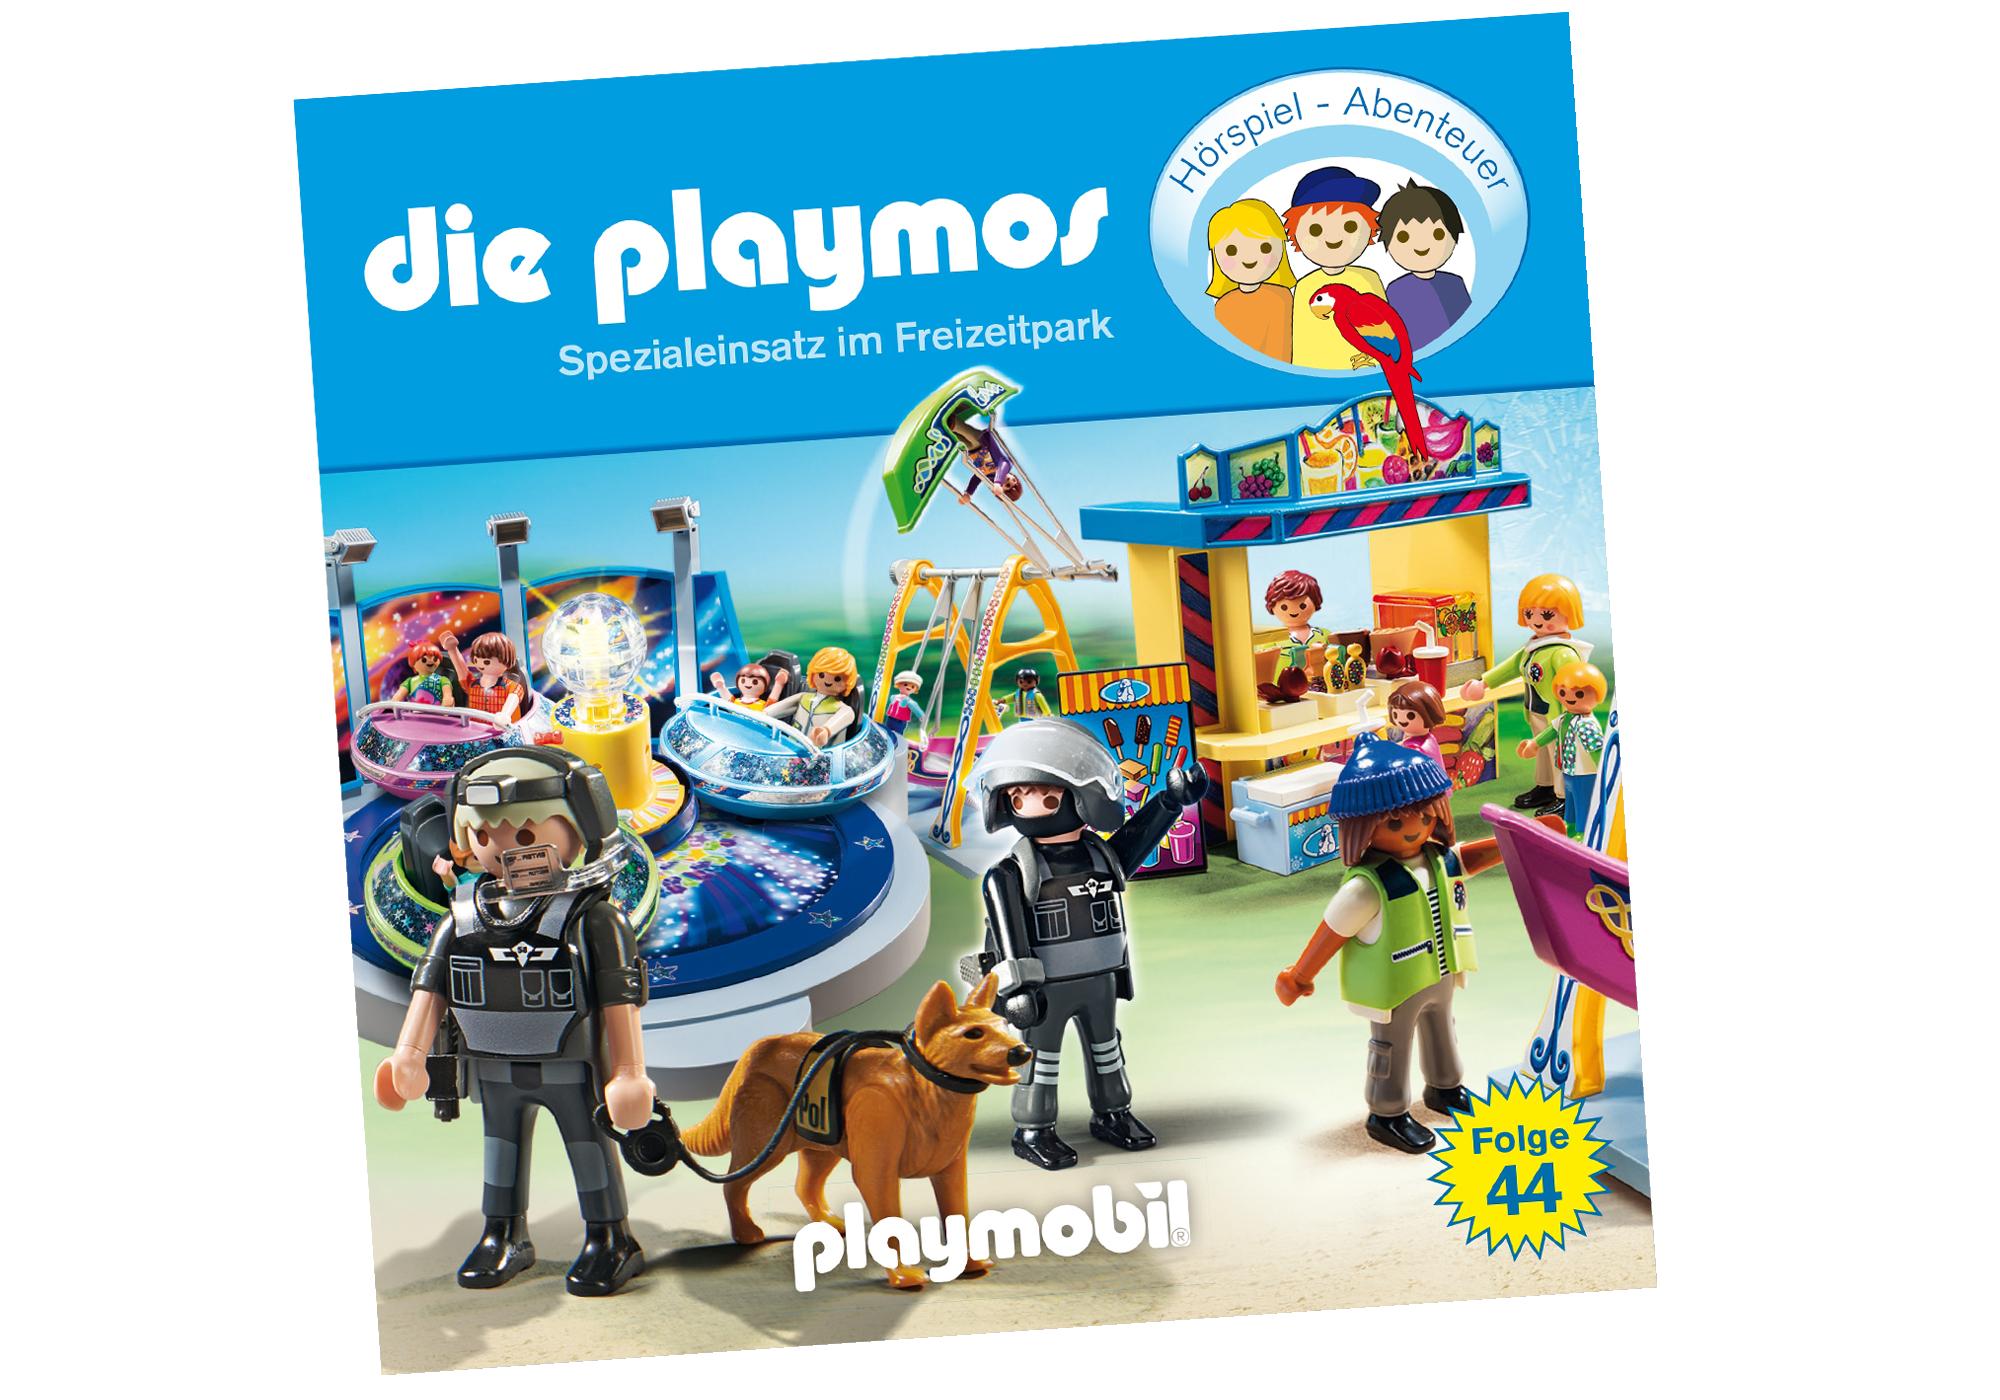 http://media.playmobil.com/i/playmobil/80457_product_detail